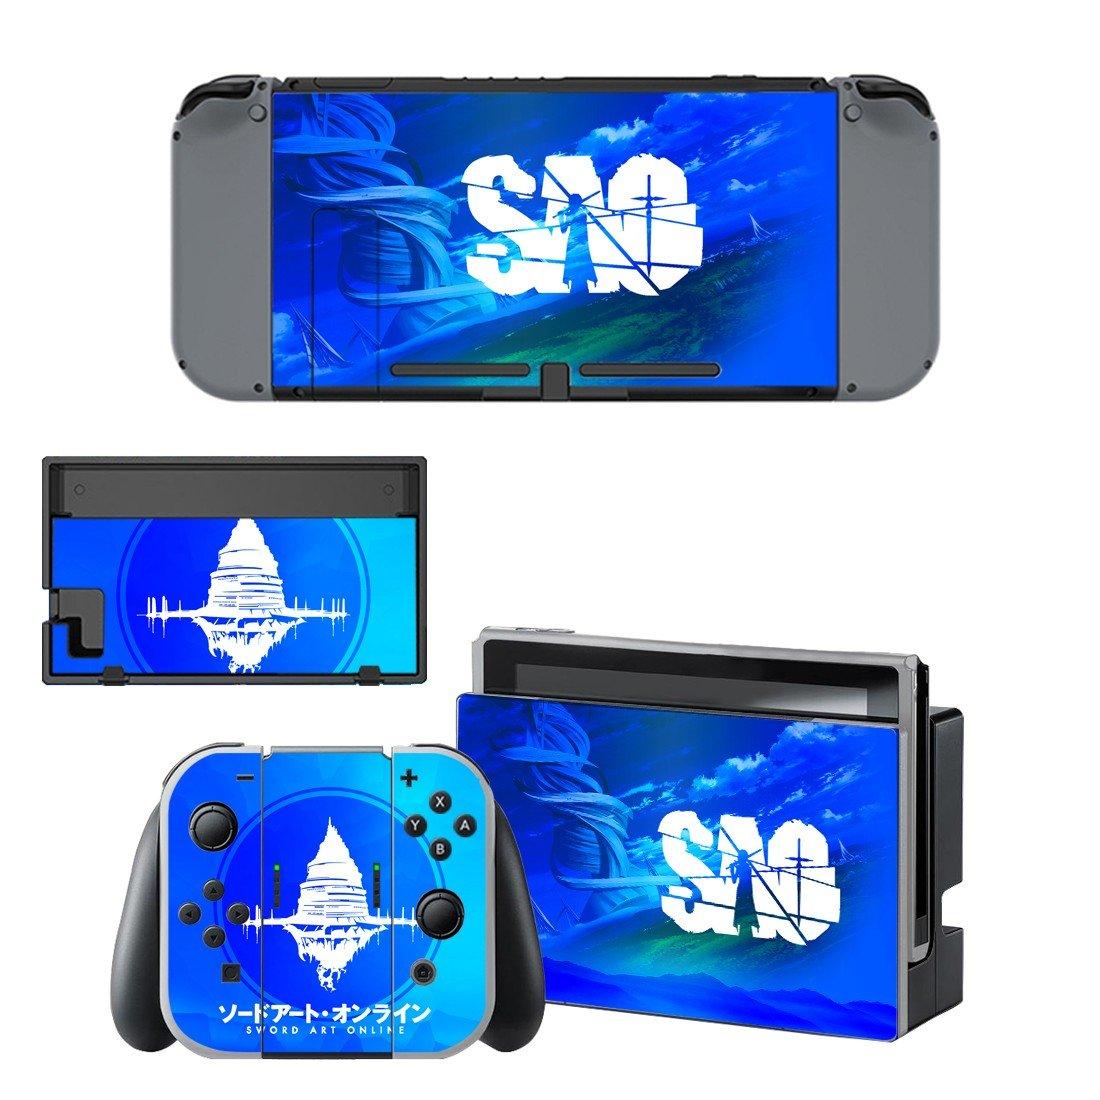 Sword art online decal for Nintendo switch console sticker skin